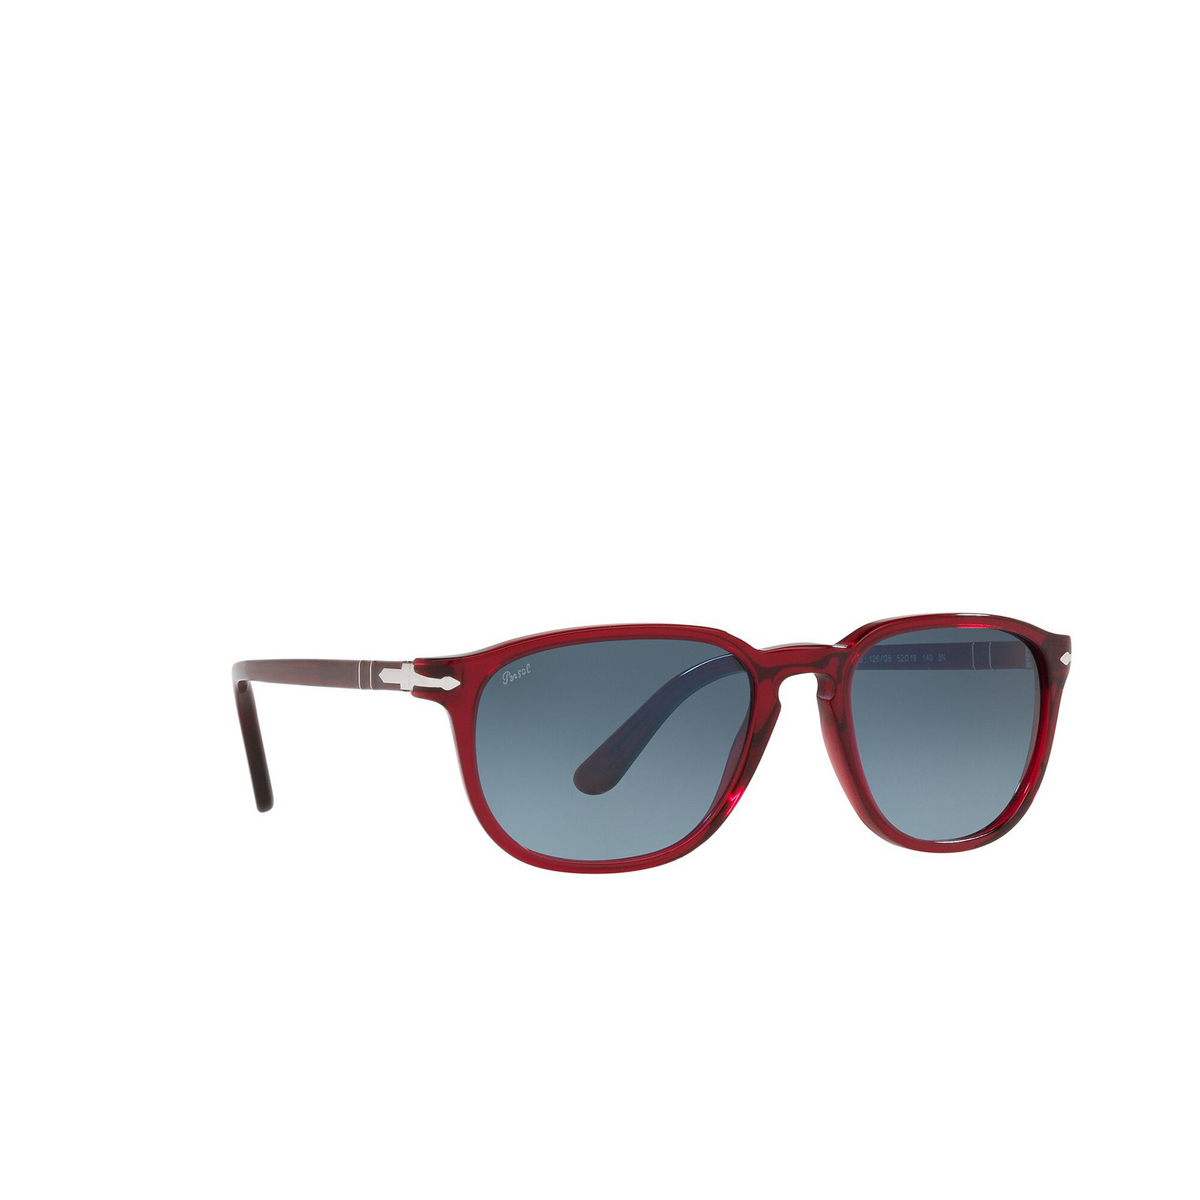 Persol® Square Sunglasses: PO3019S color Transparent Red 126/Q8 - three-quarters view.